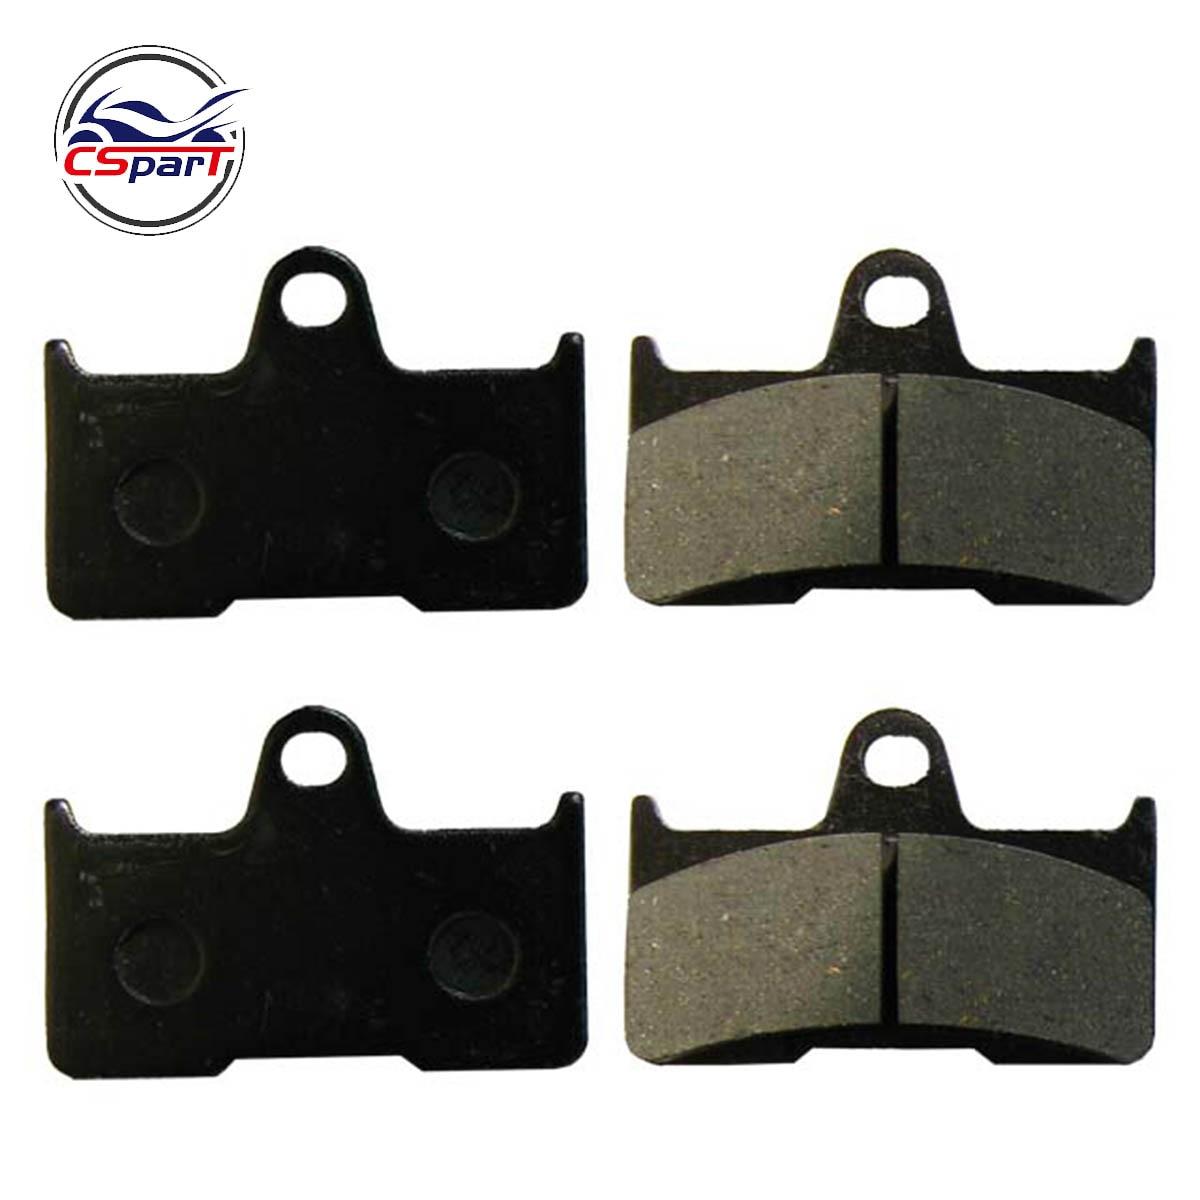 2 Pairs 4PCS Rear Brake Pad  Semi Metallic Non Asbestos CFMoto CF500 500 500CC CF188 CF600 600 600CC CF196 ATV UTV Shineary